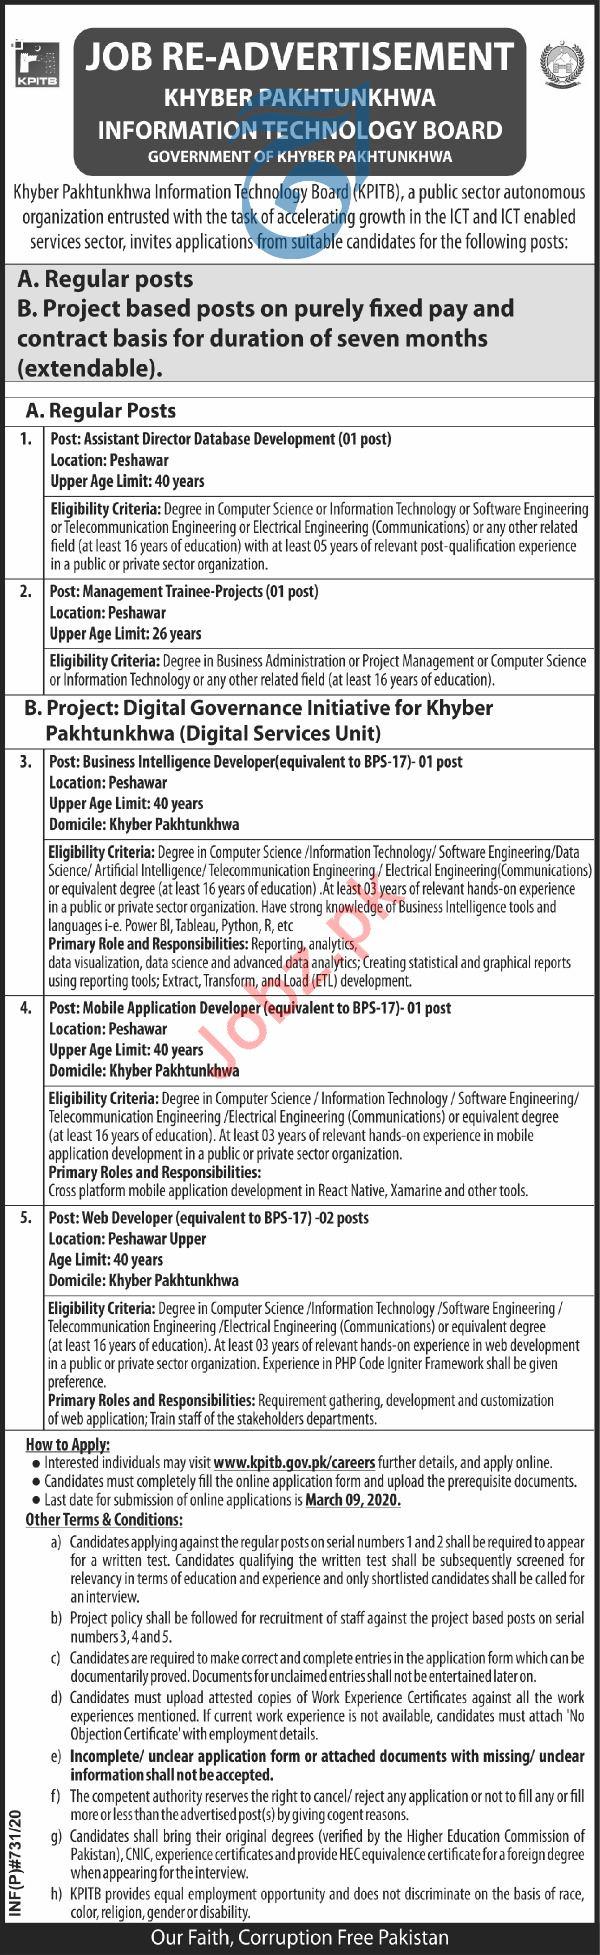 Khyber Pakhtunkhwa Infromation Technology Board Jobs 2020